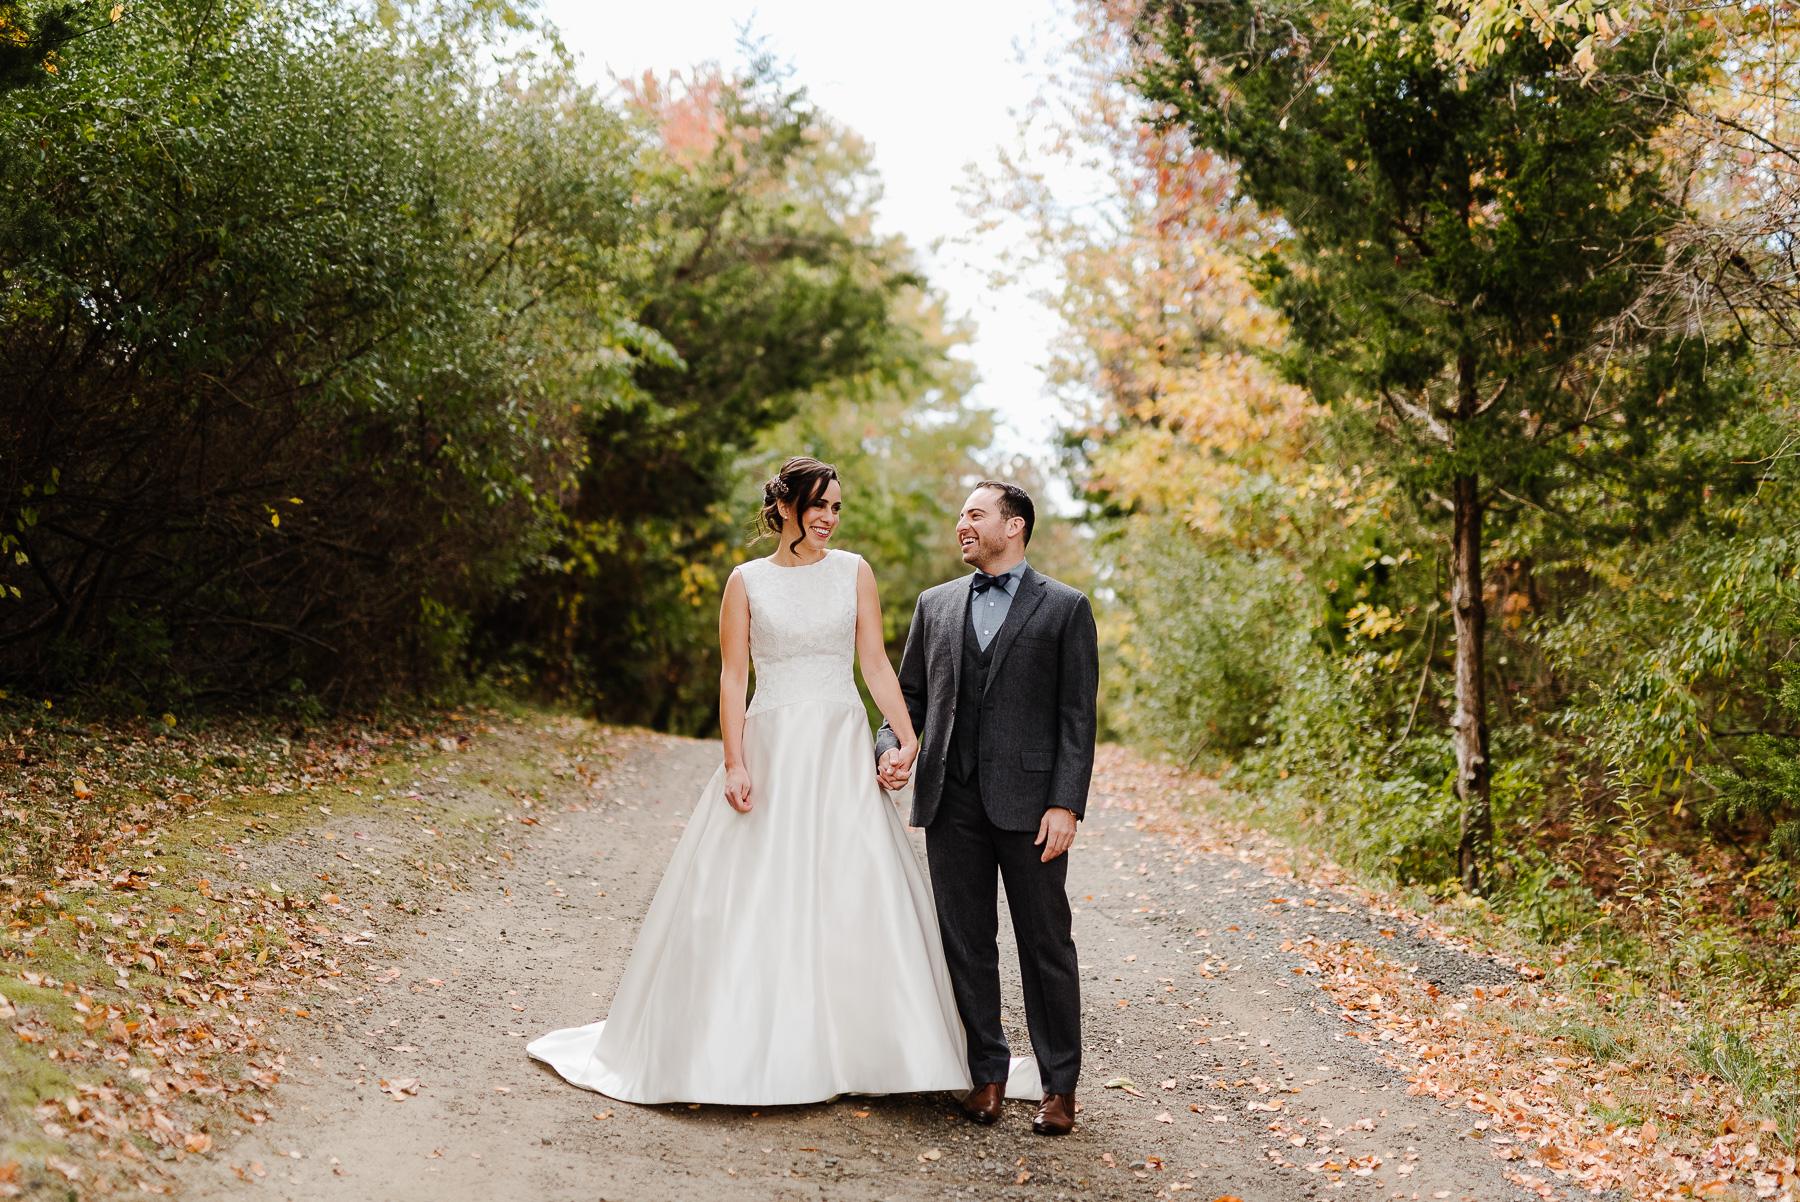 20-Laurita Winery Wedding New Jersey Wedding Photographer Laurita Winery Weddings Longbrook Photography.jpg